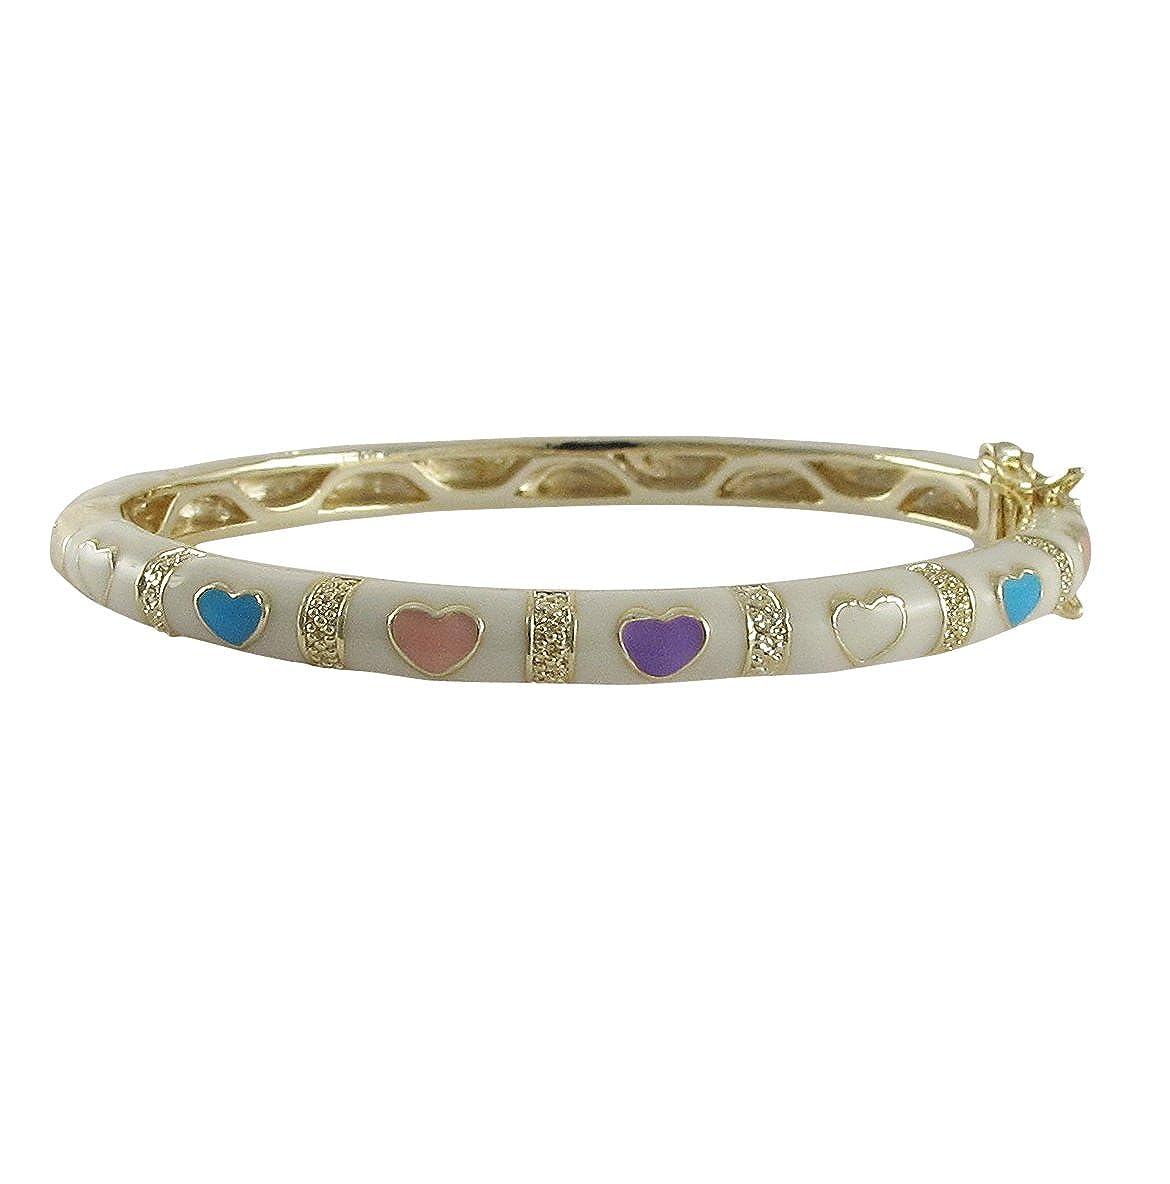 Ivy and Max Gold Finish White Enamel Multi-Color Hearts Girls Bangle Bracelet LFB6051-GD-WhtMltIM